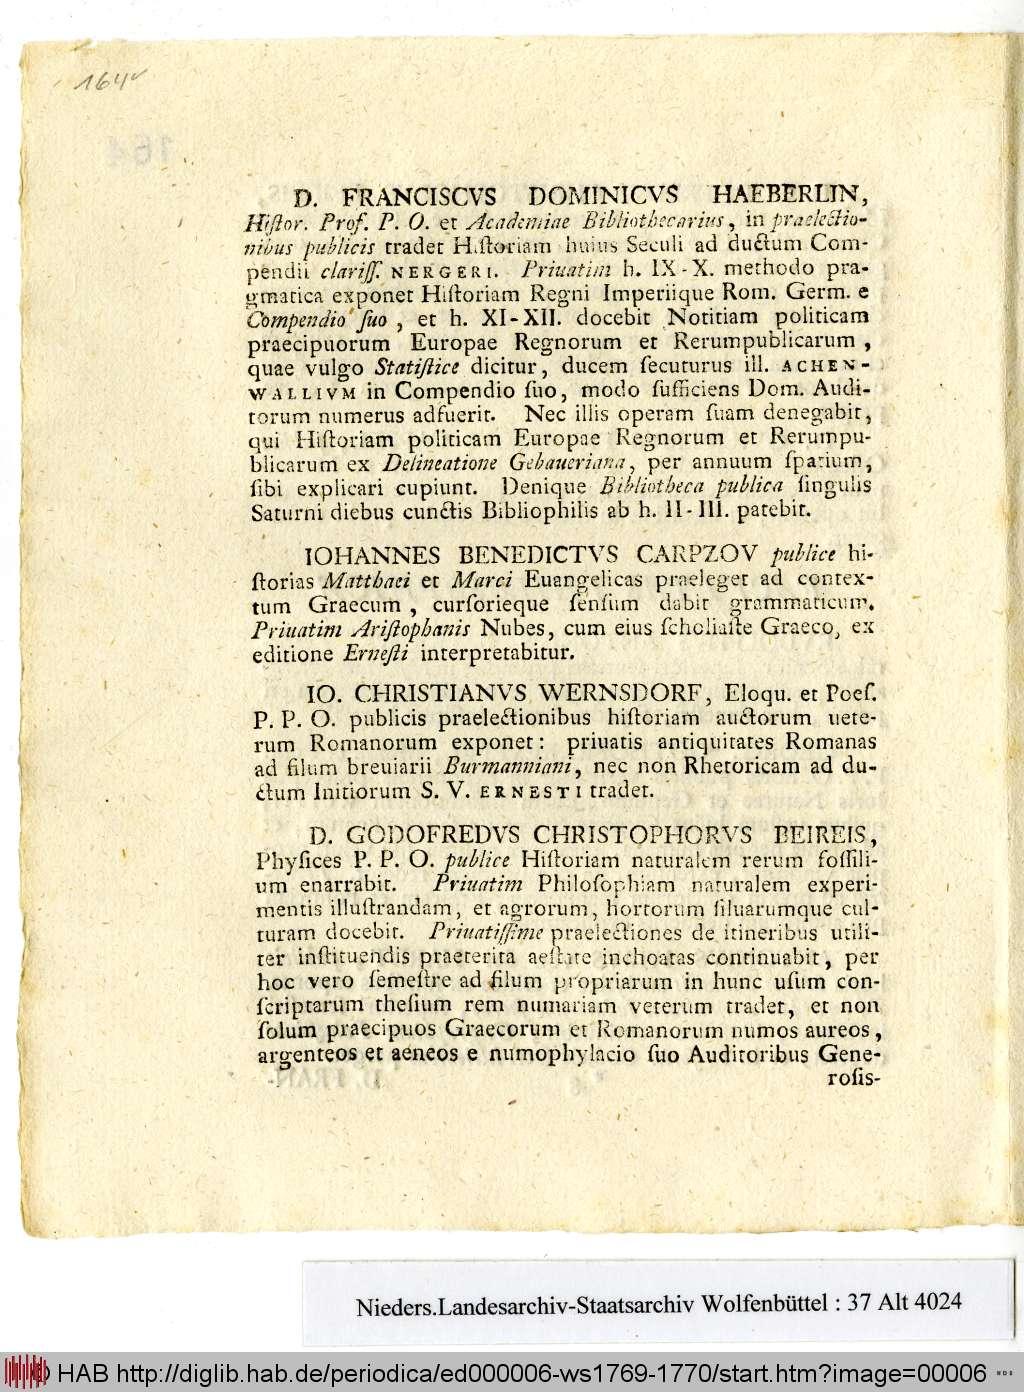 http://diglib.hab.de/periodica/ed000006-ws1769-1770/00006.jpg